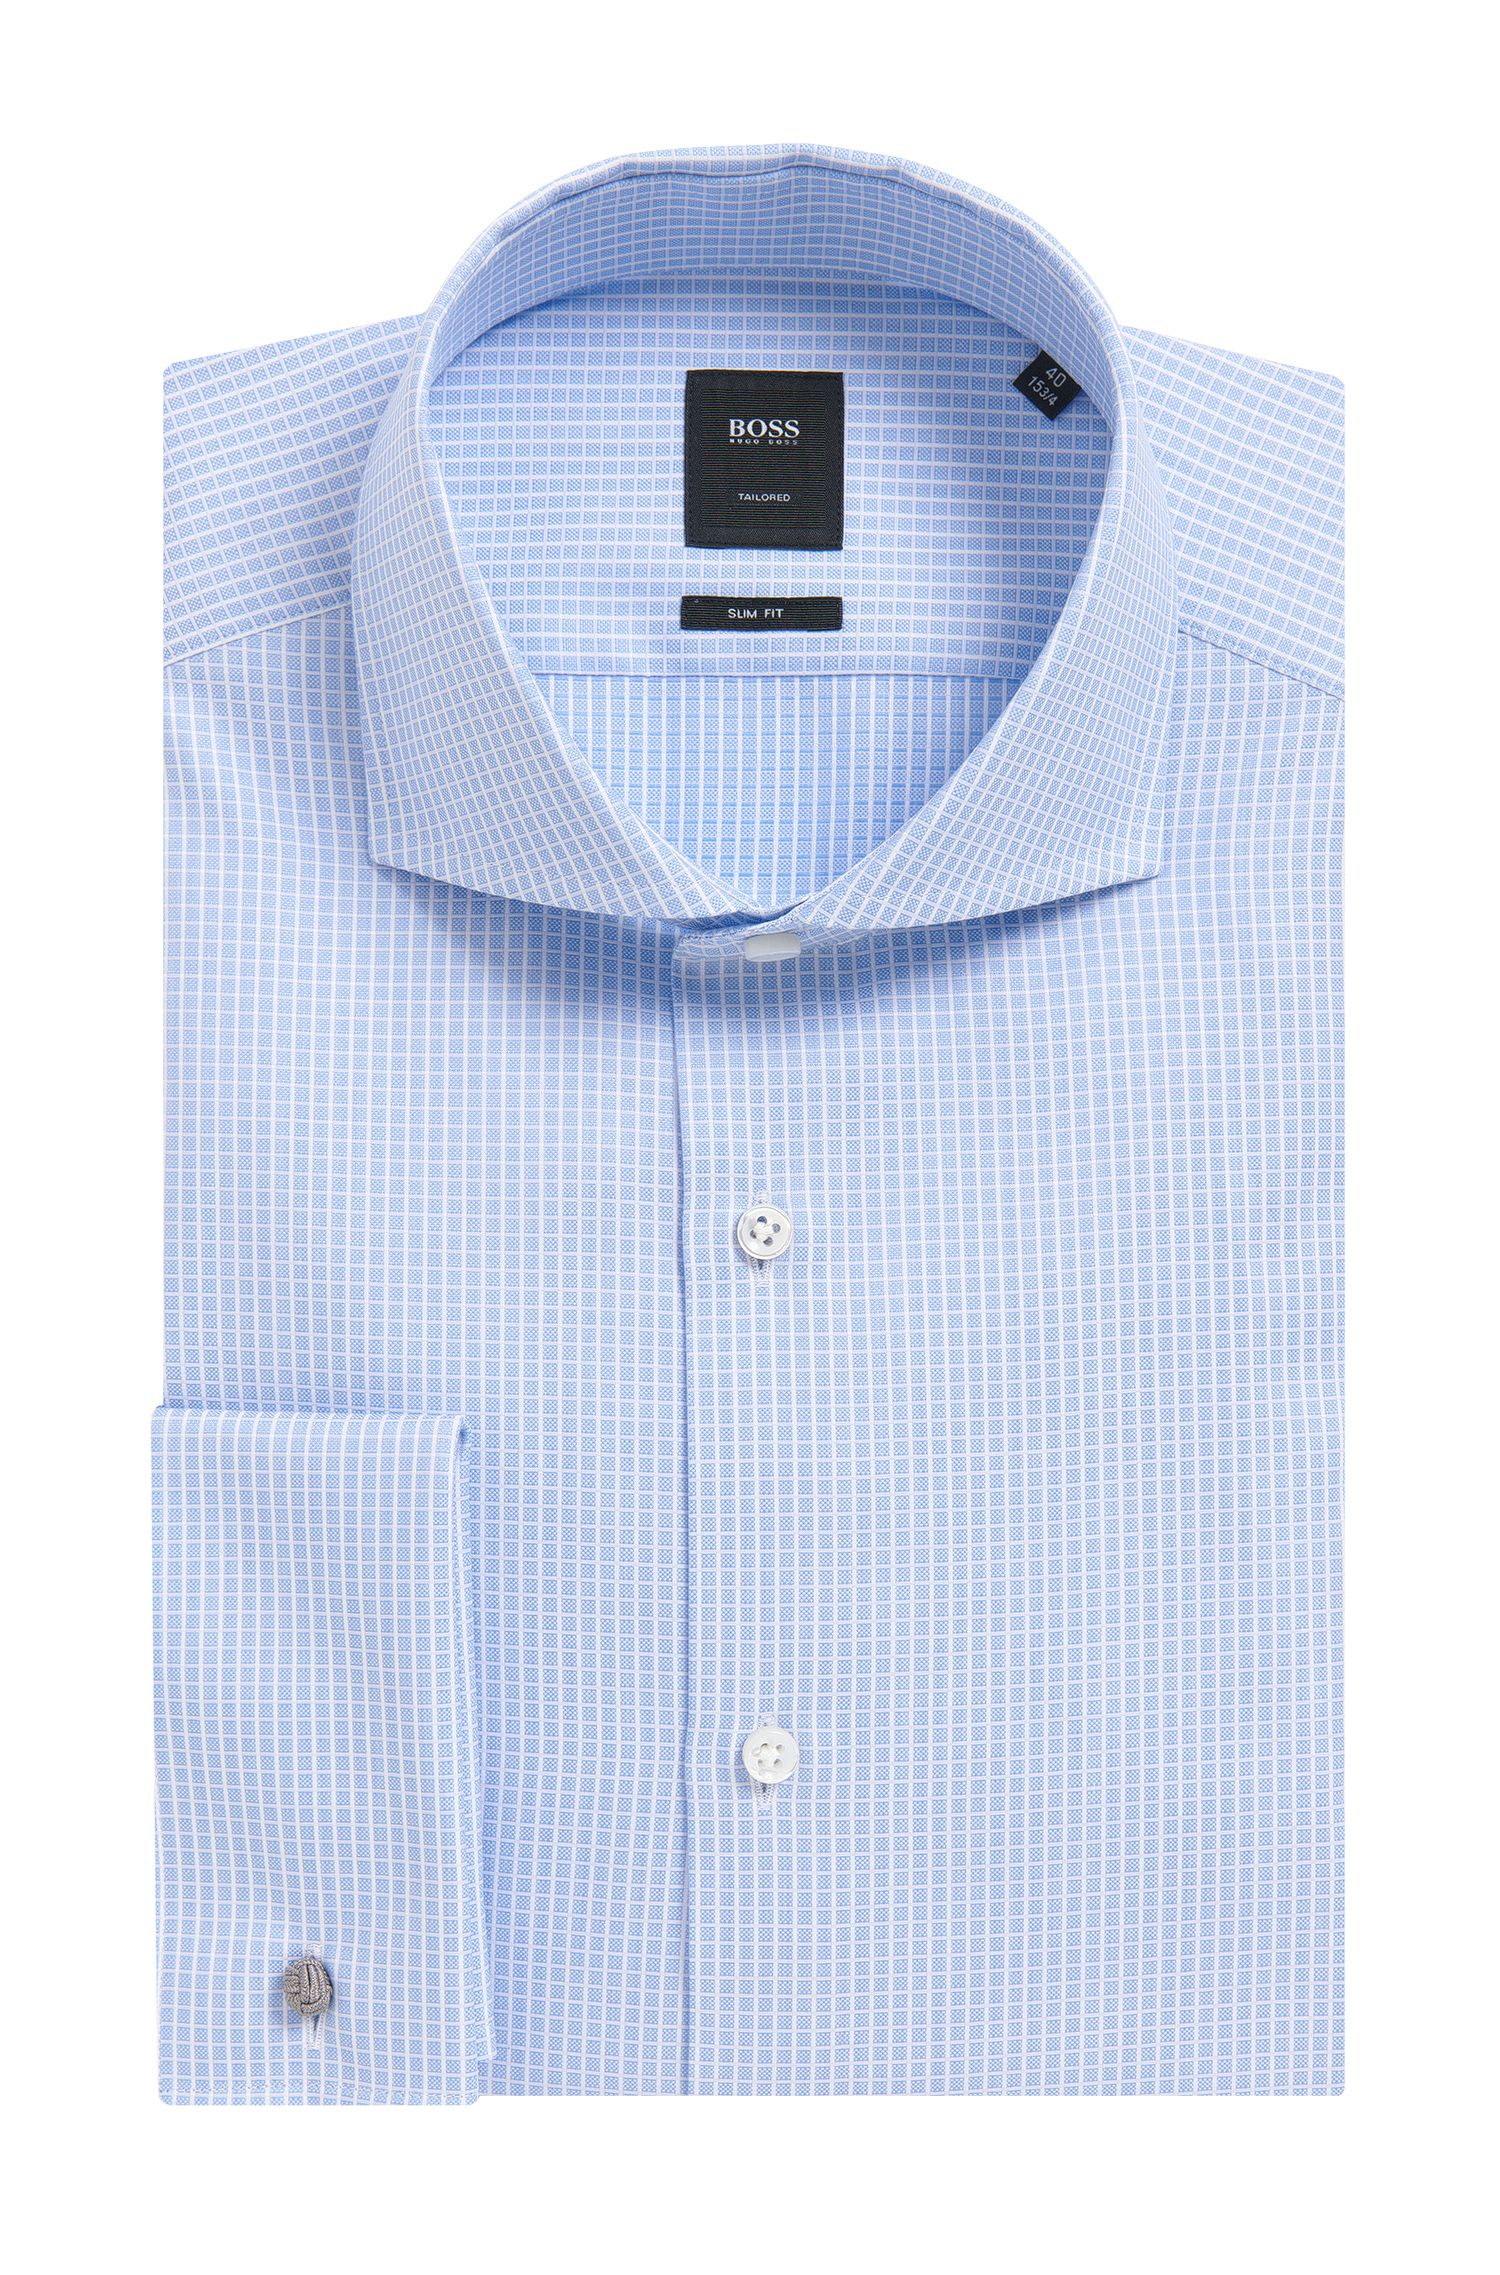 'T-Yacob' | Slim Fit, French Cuff Graph Check Cotton Dress Shirt